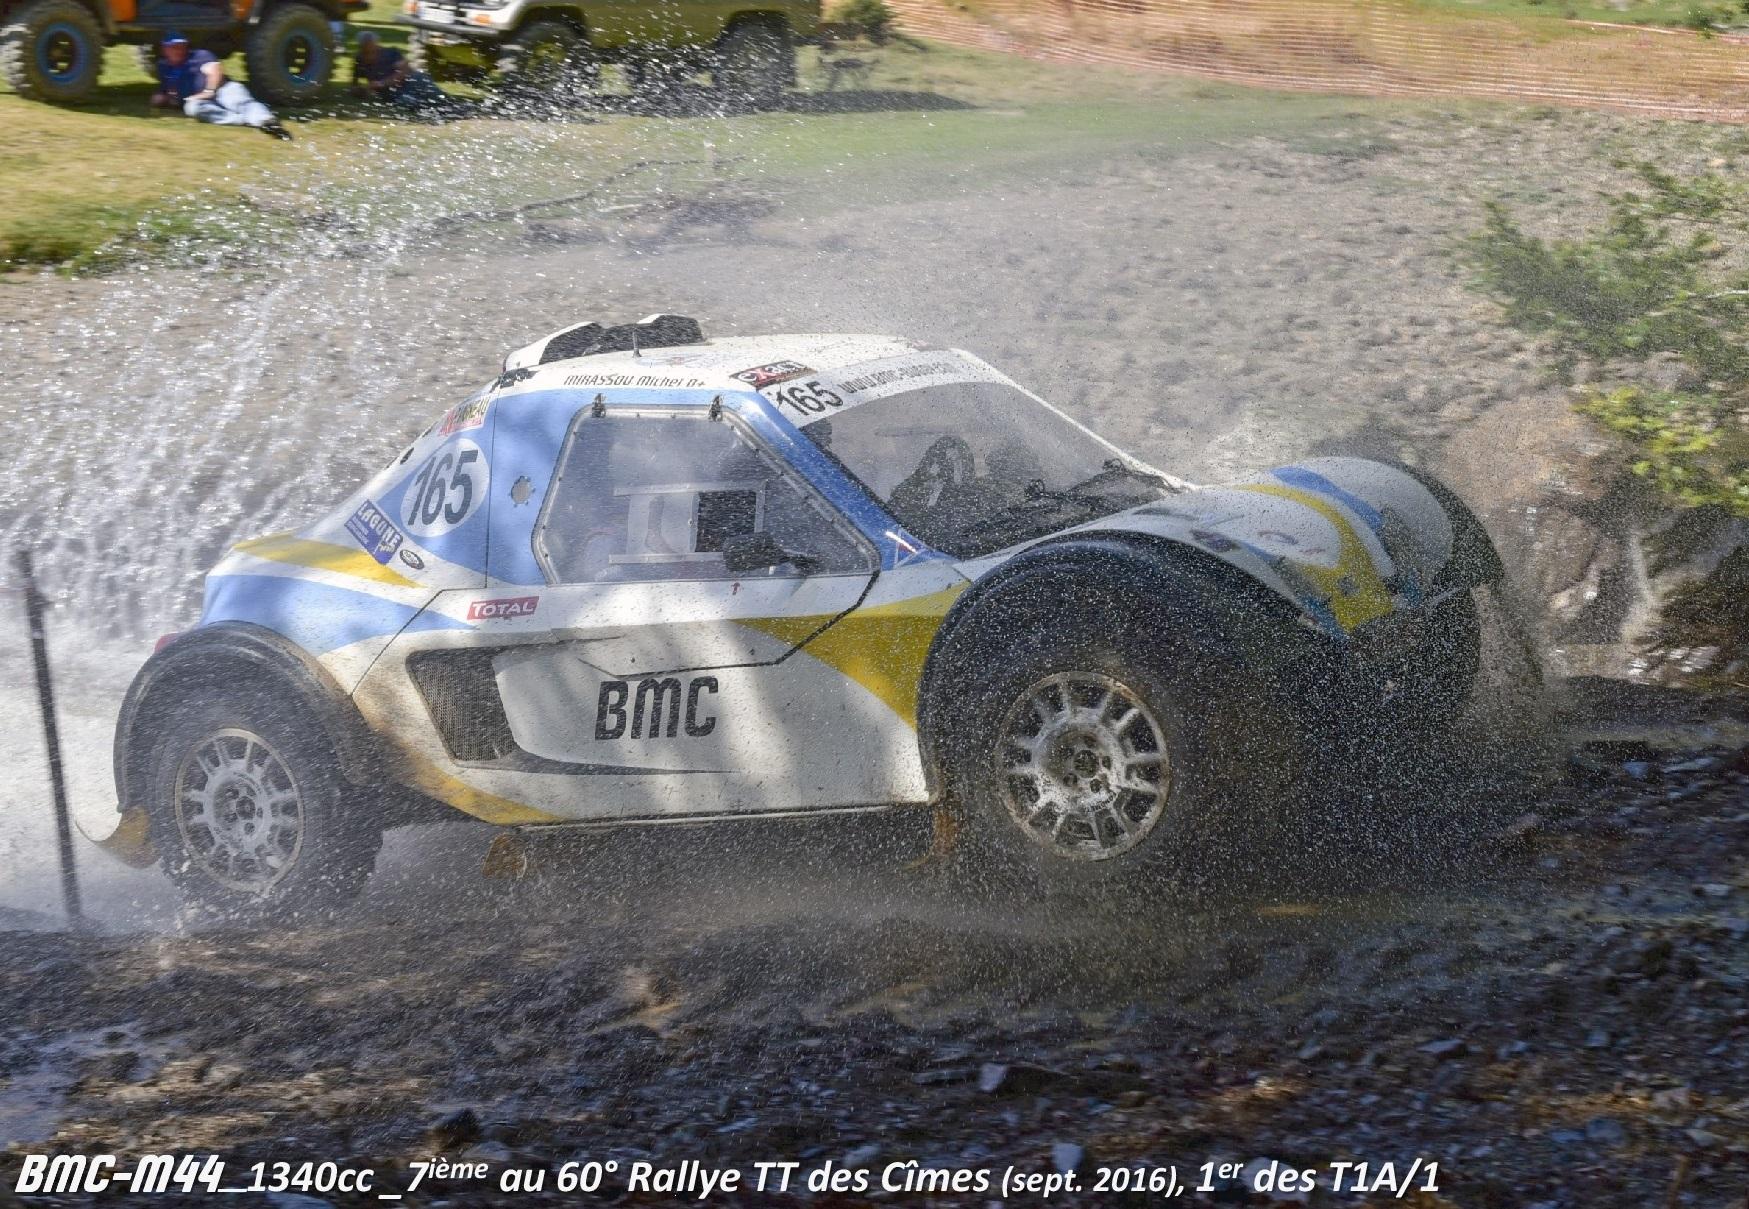 BMC-M44_Saison 2016_05